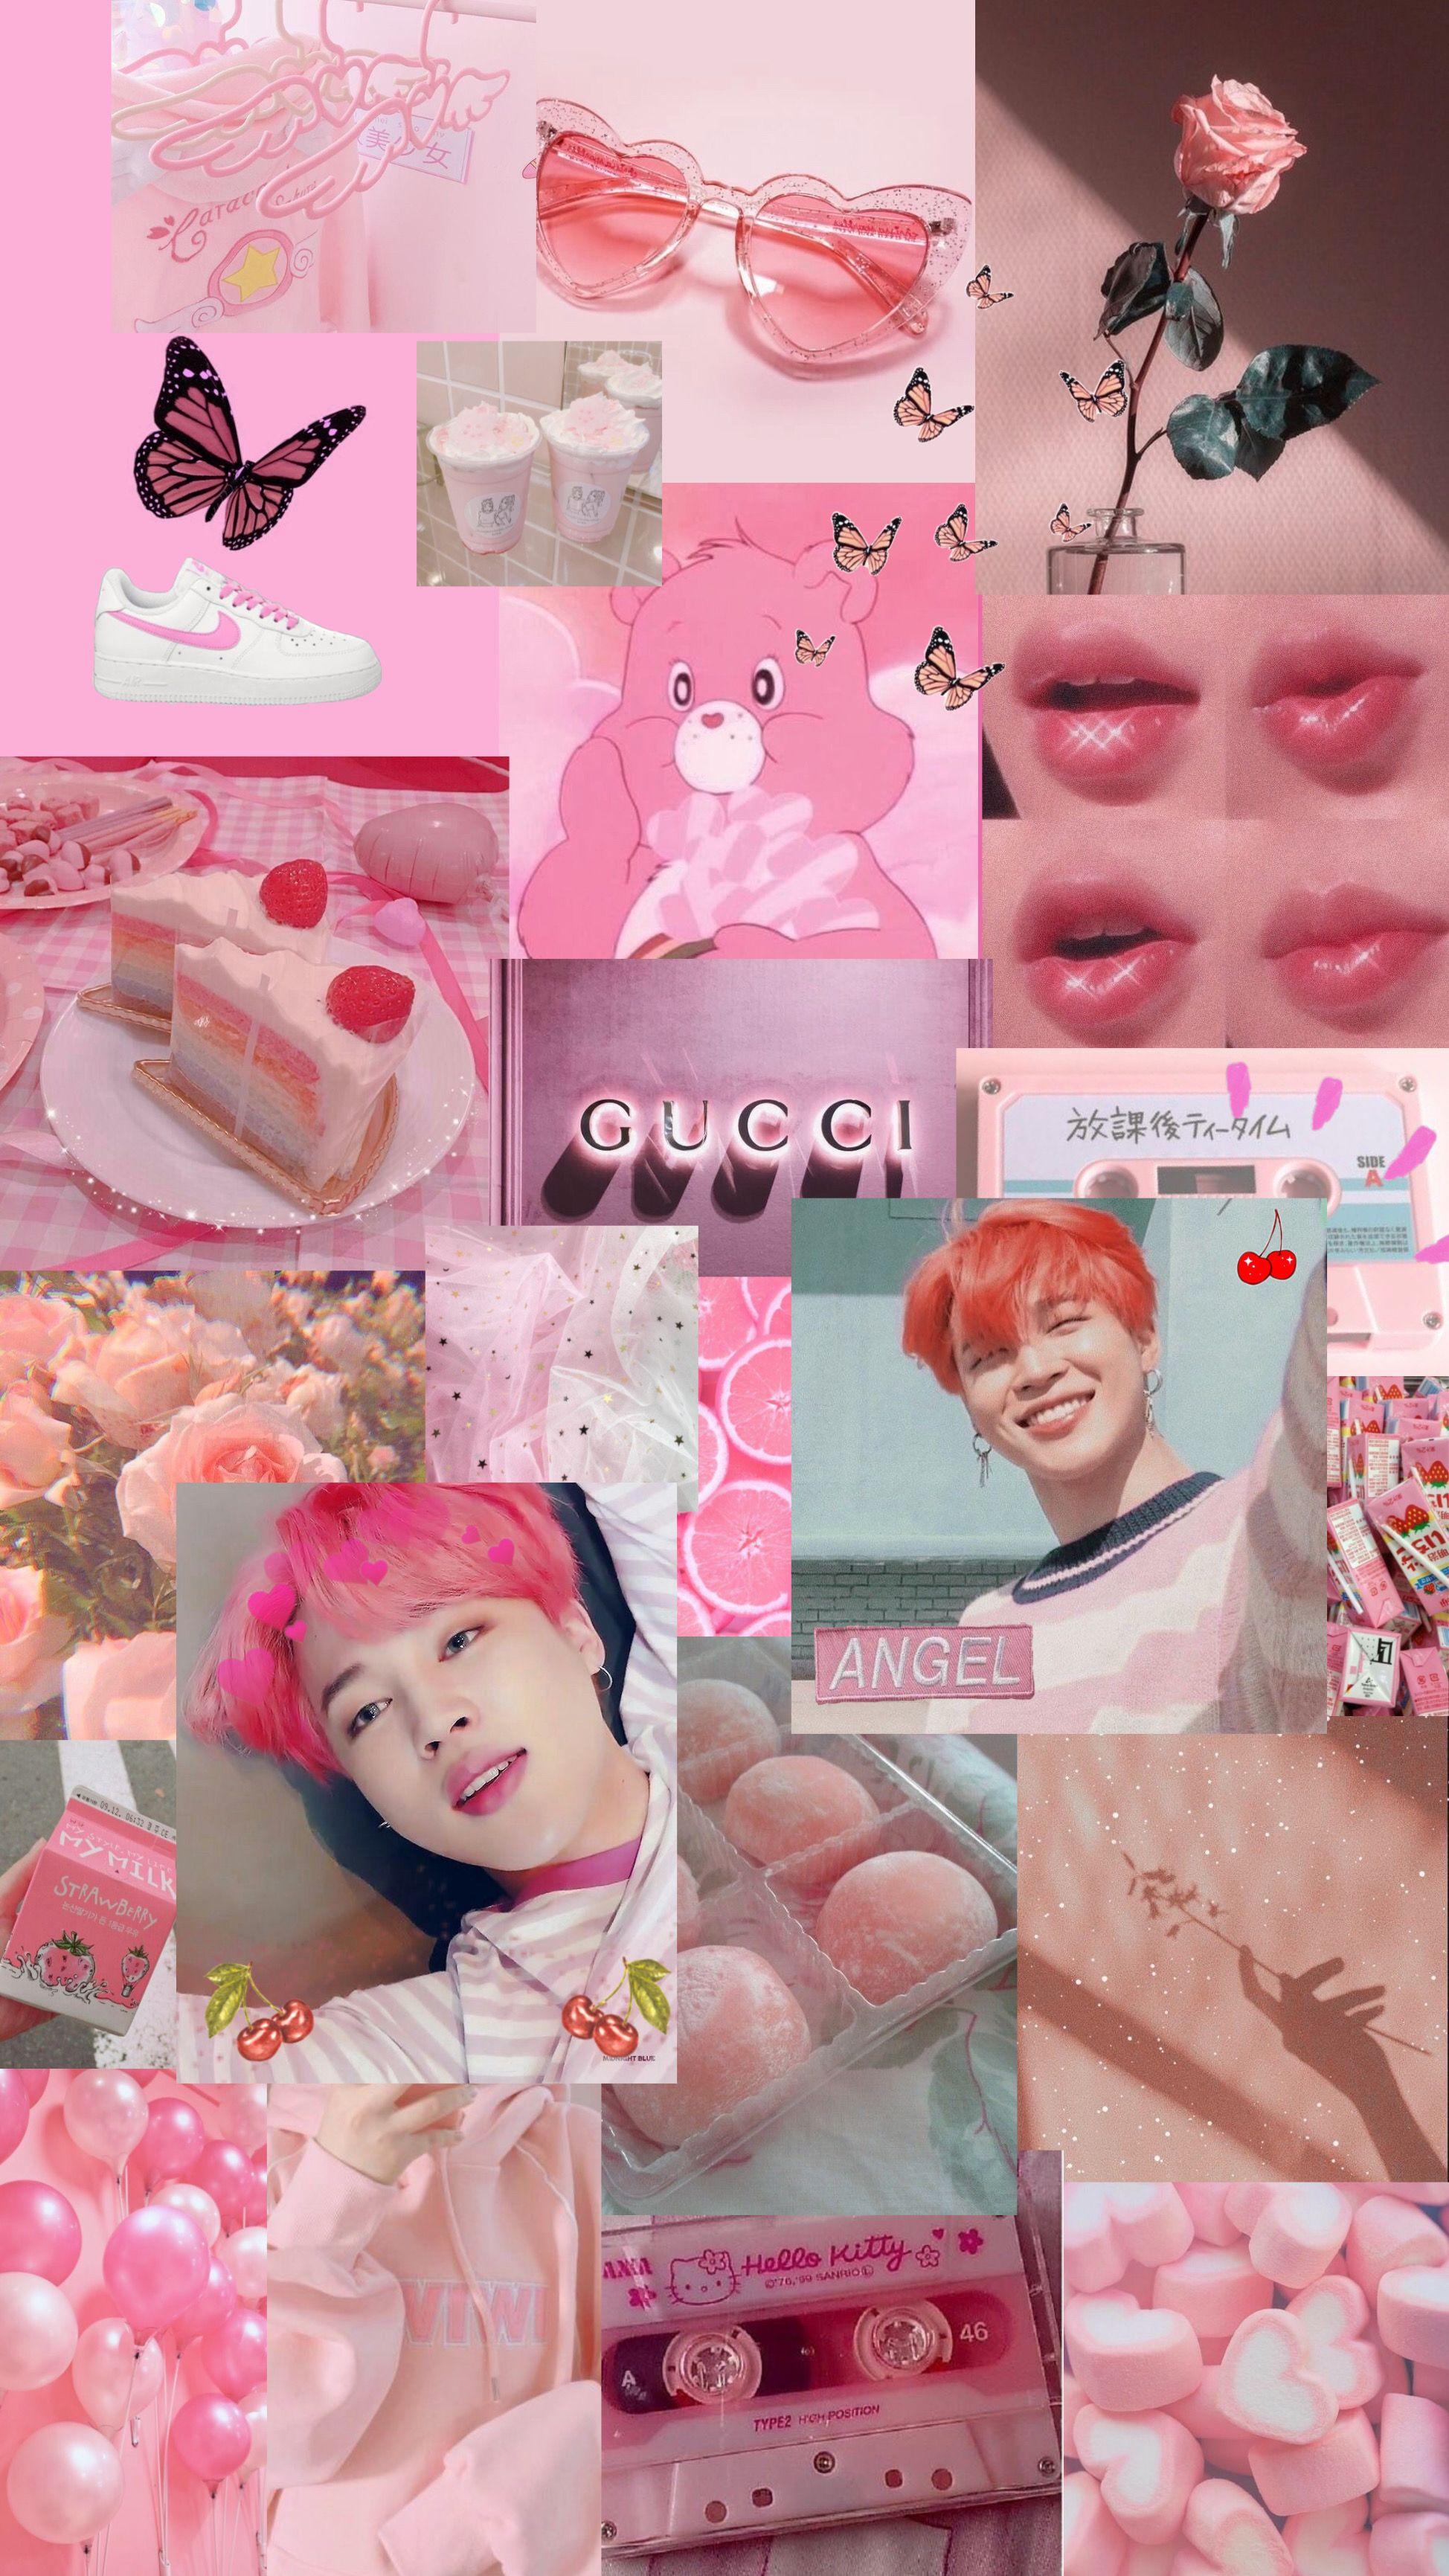 Jimin Pink Collage Aesthetic Jimin Wallpaper Jimin Pictures Park Jimin Cute Aesthetic jimin cute wallpaper